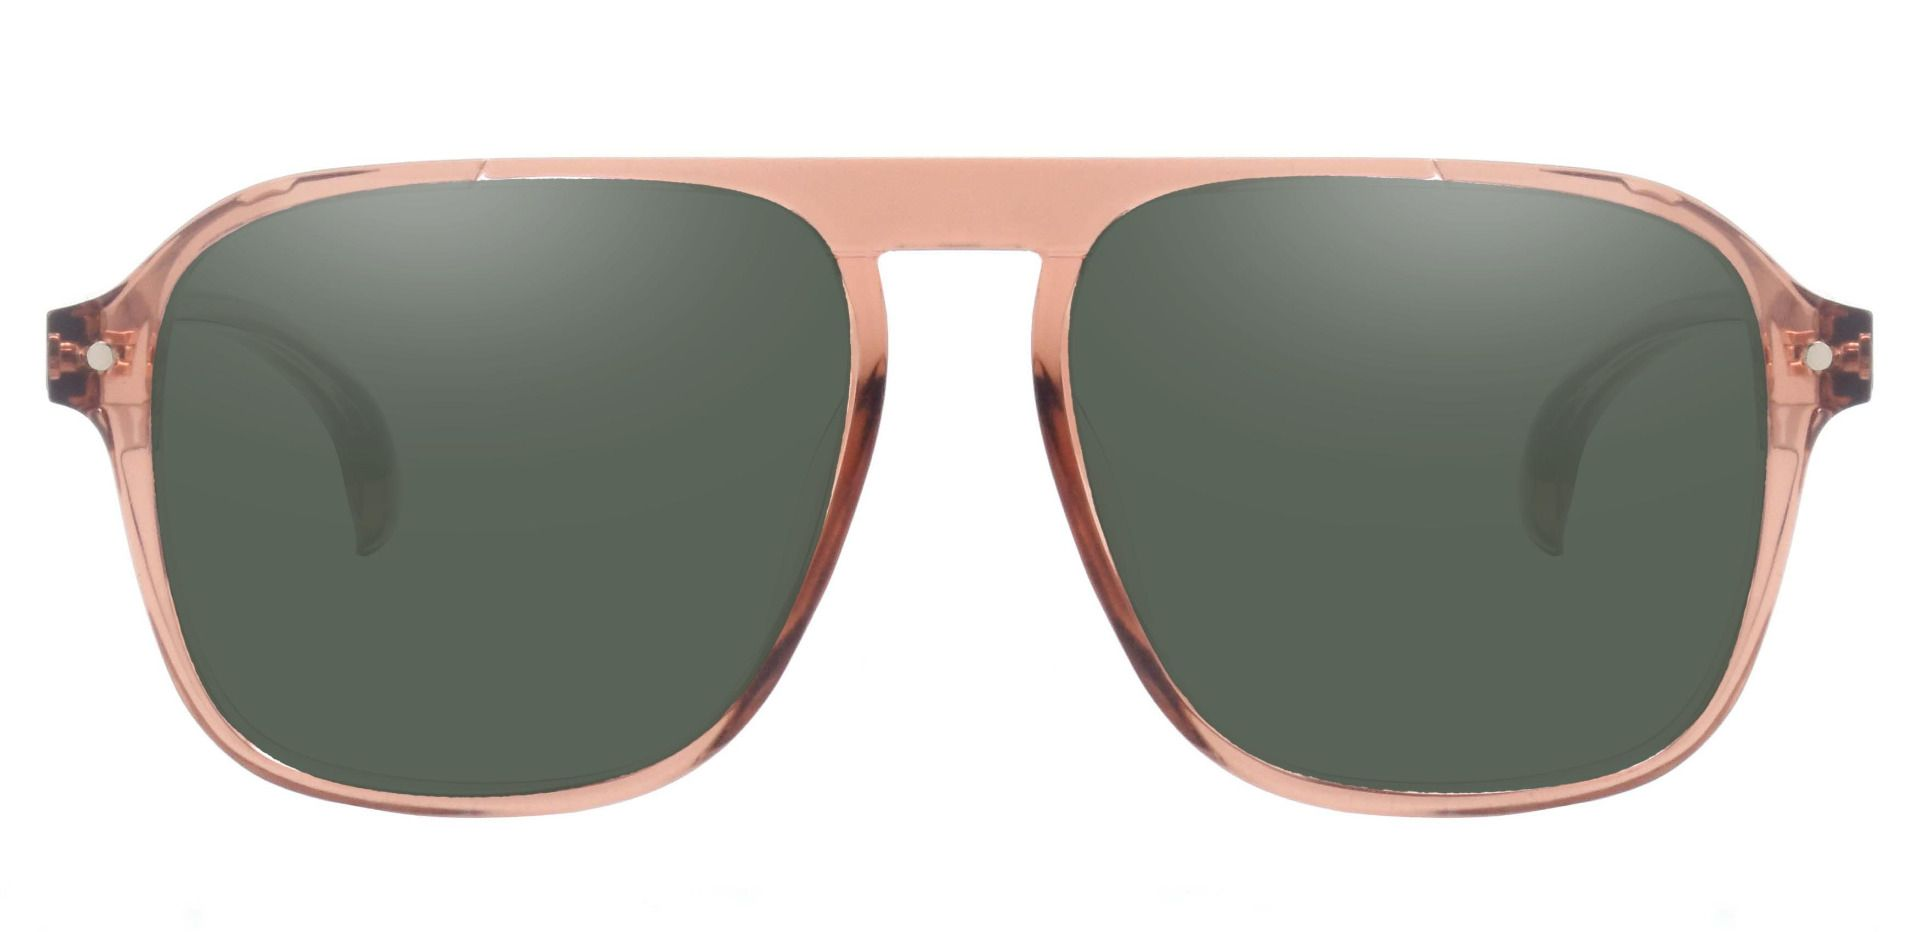 Gideon Aviator Reading Sunglasses - Brown Frame With Green Lenses